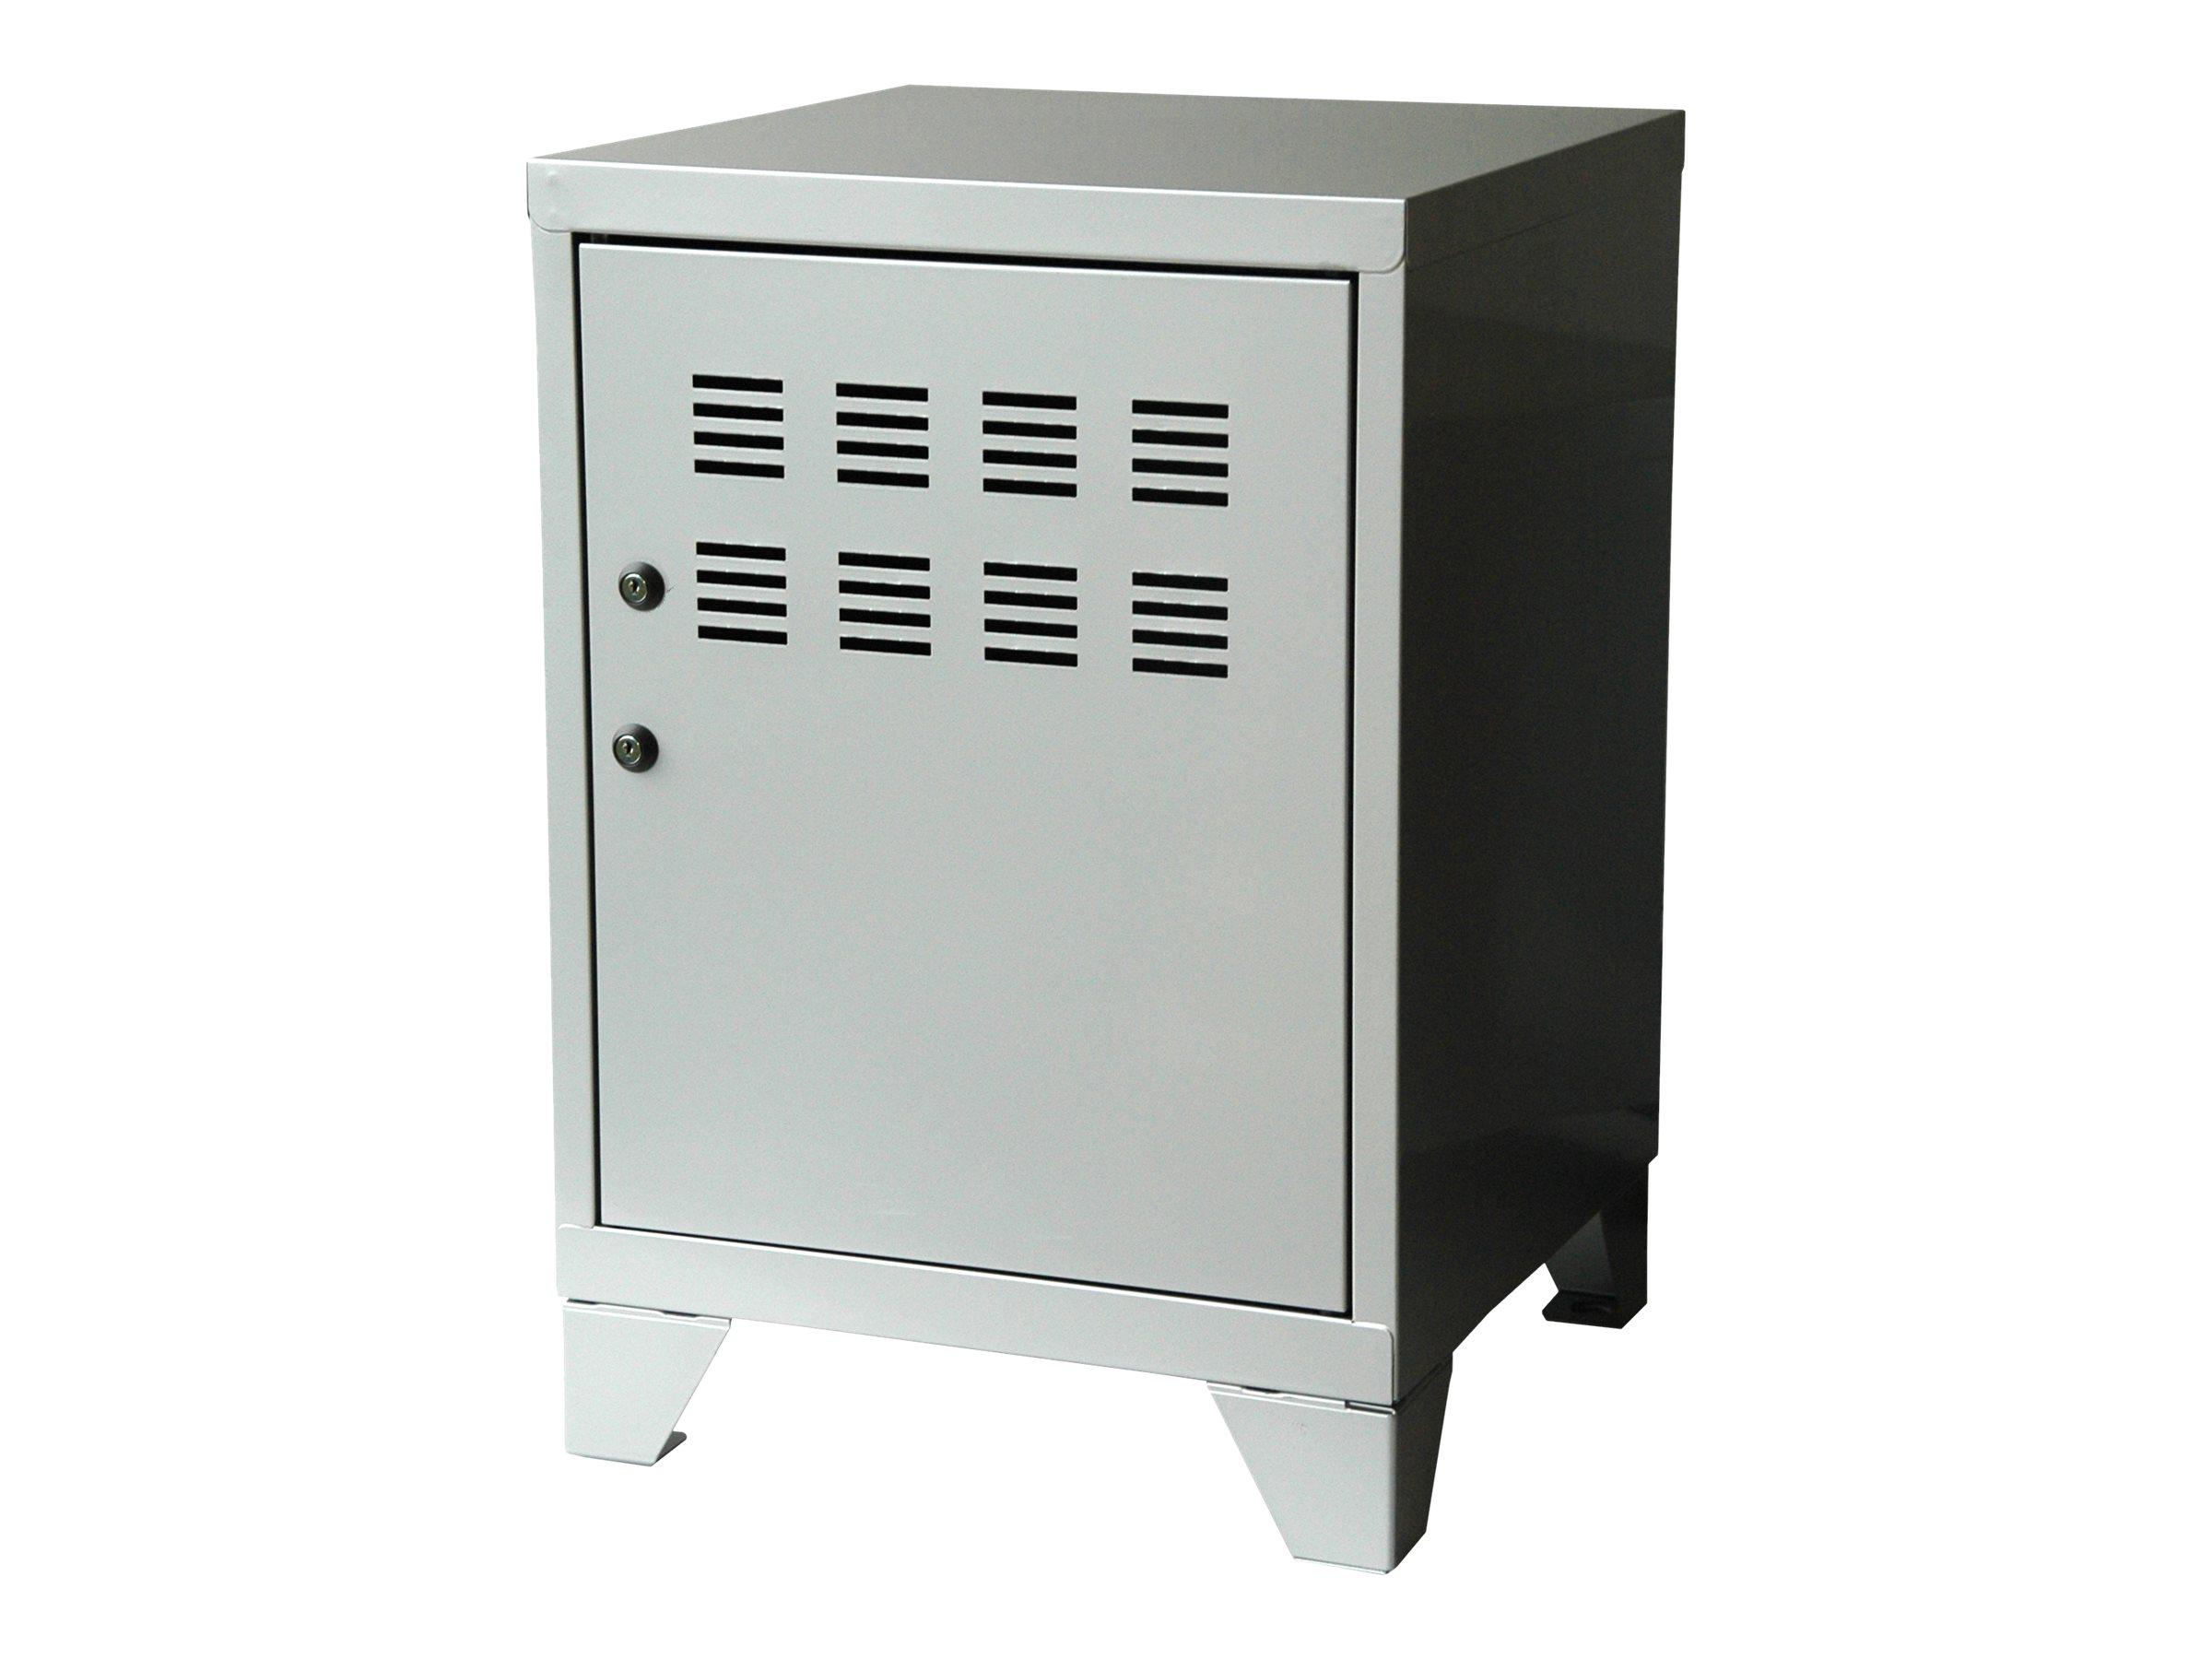 Casier de bureau avec pieds - 57,5 x 40 x 40 cm - aluminium